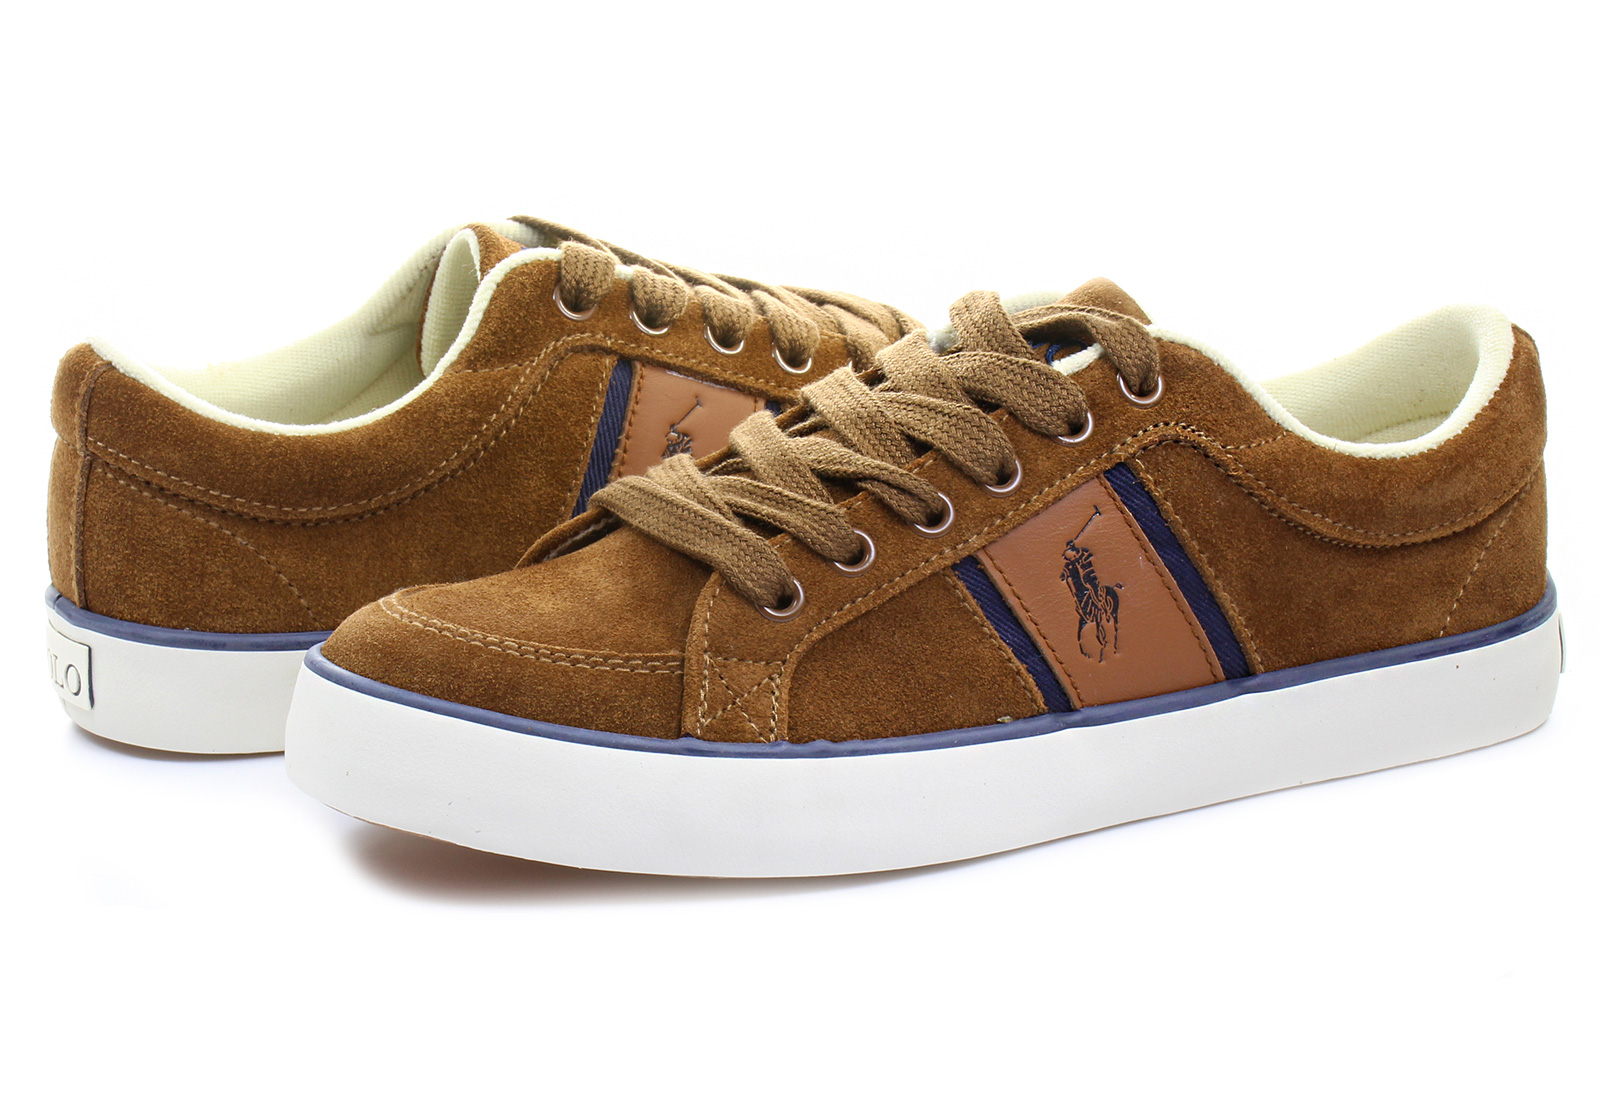 Polo Ralph Lauren Shoes - Bolingbrook II - 217-r-w2fdc - Online shop ... 24c844d297